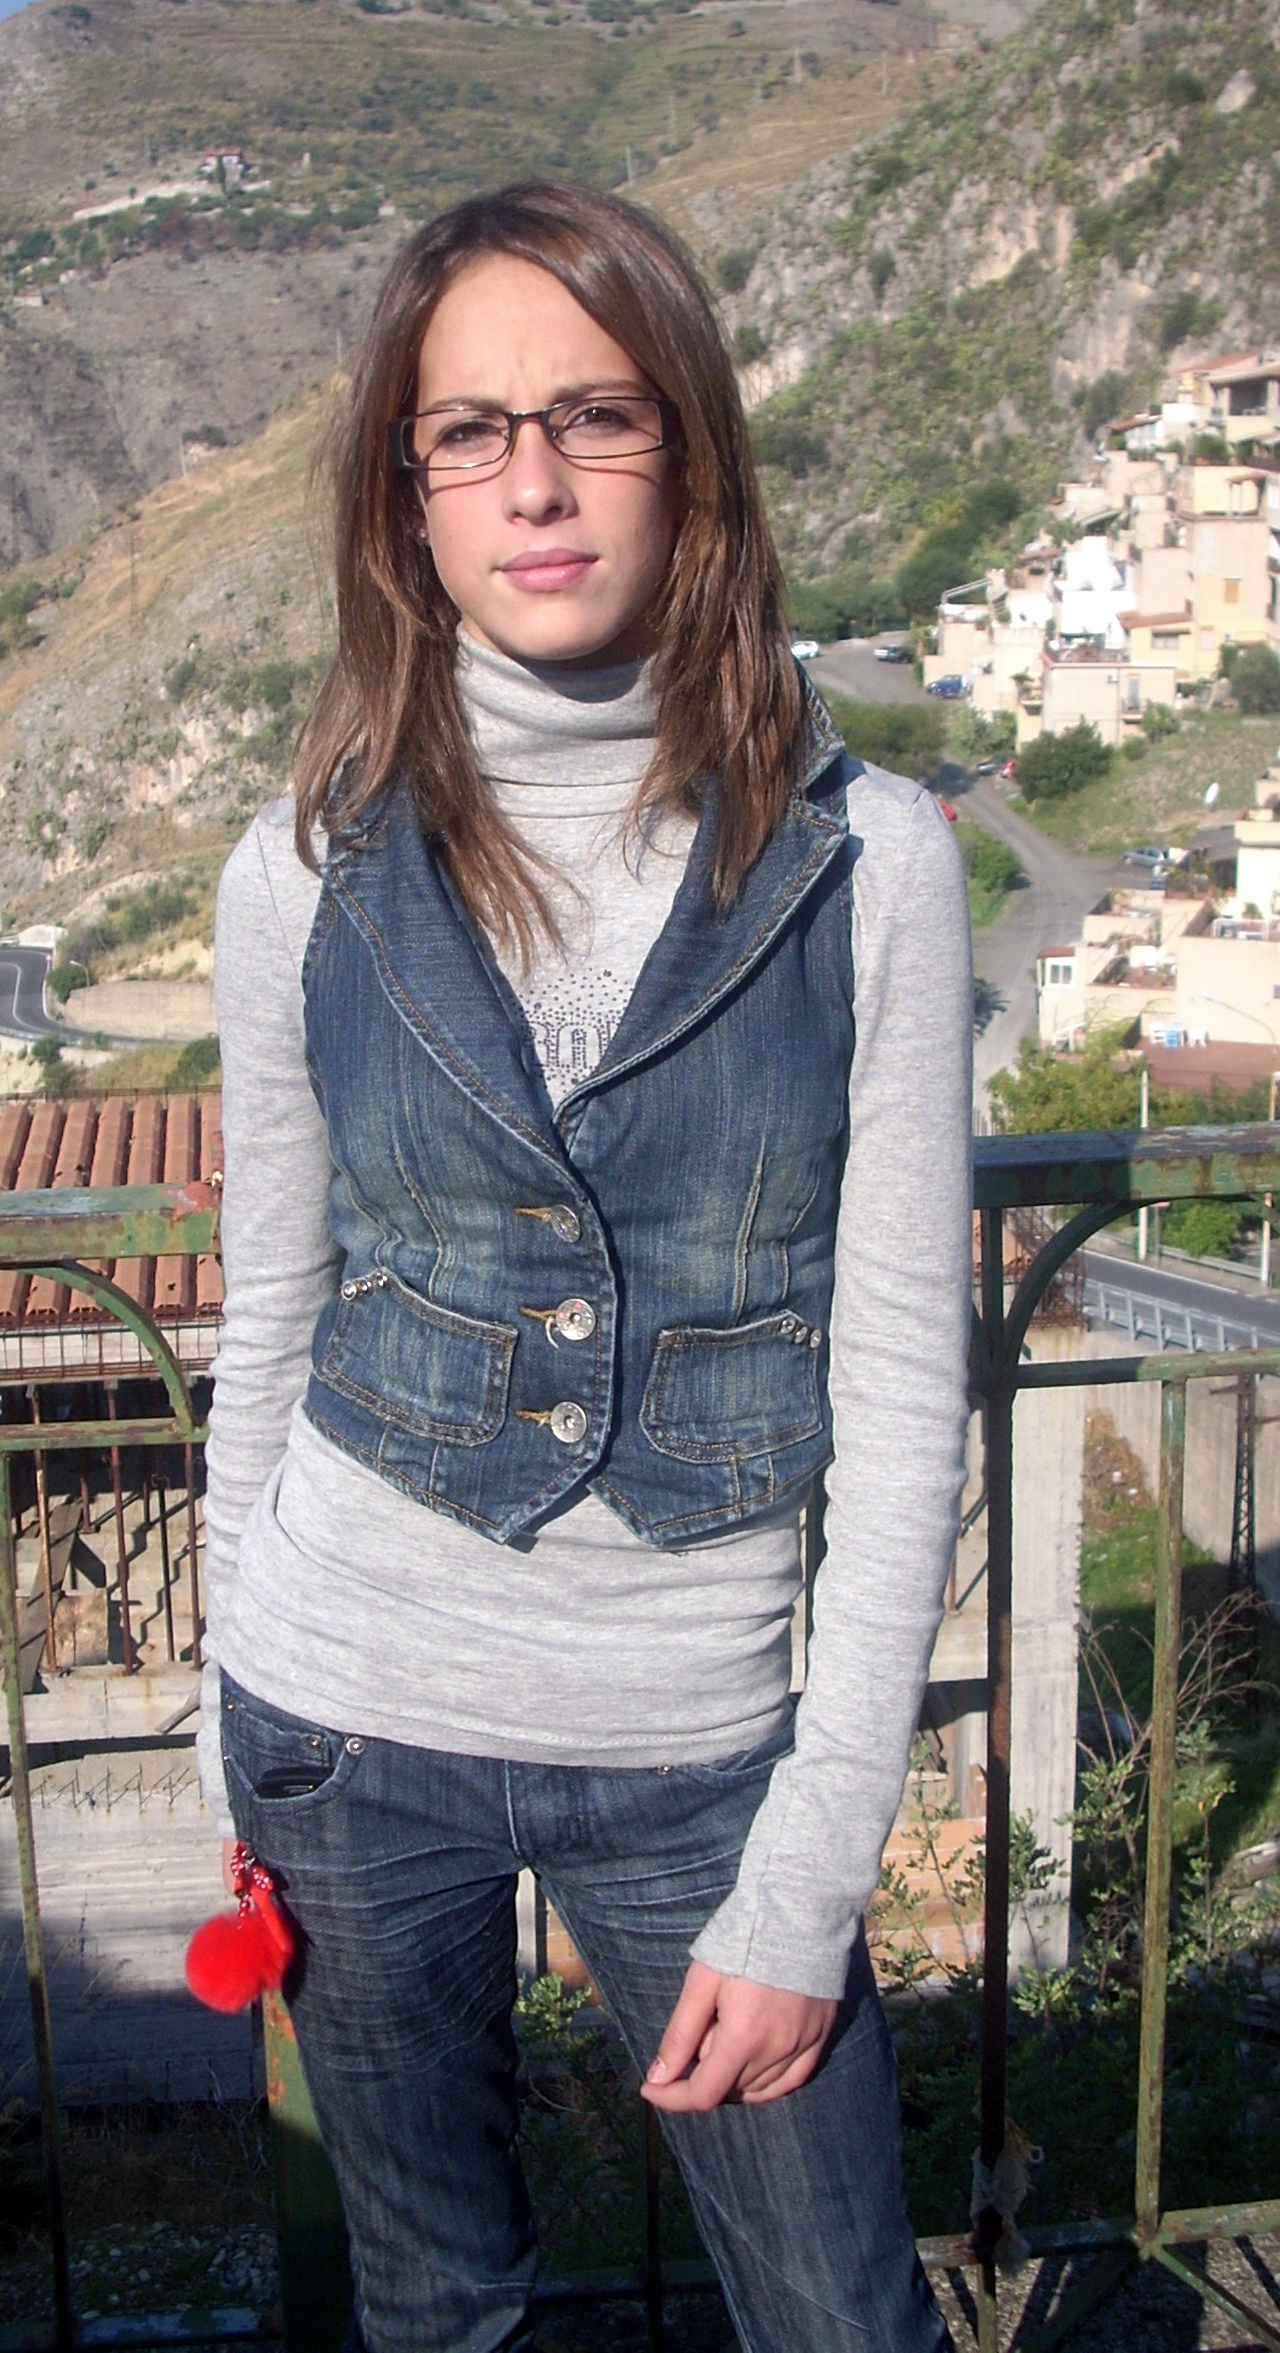 file young girl denim waistcoat jpg   wikipedia  the free encyclopedia